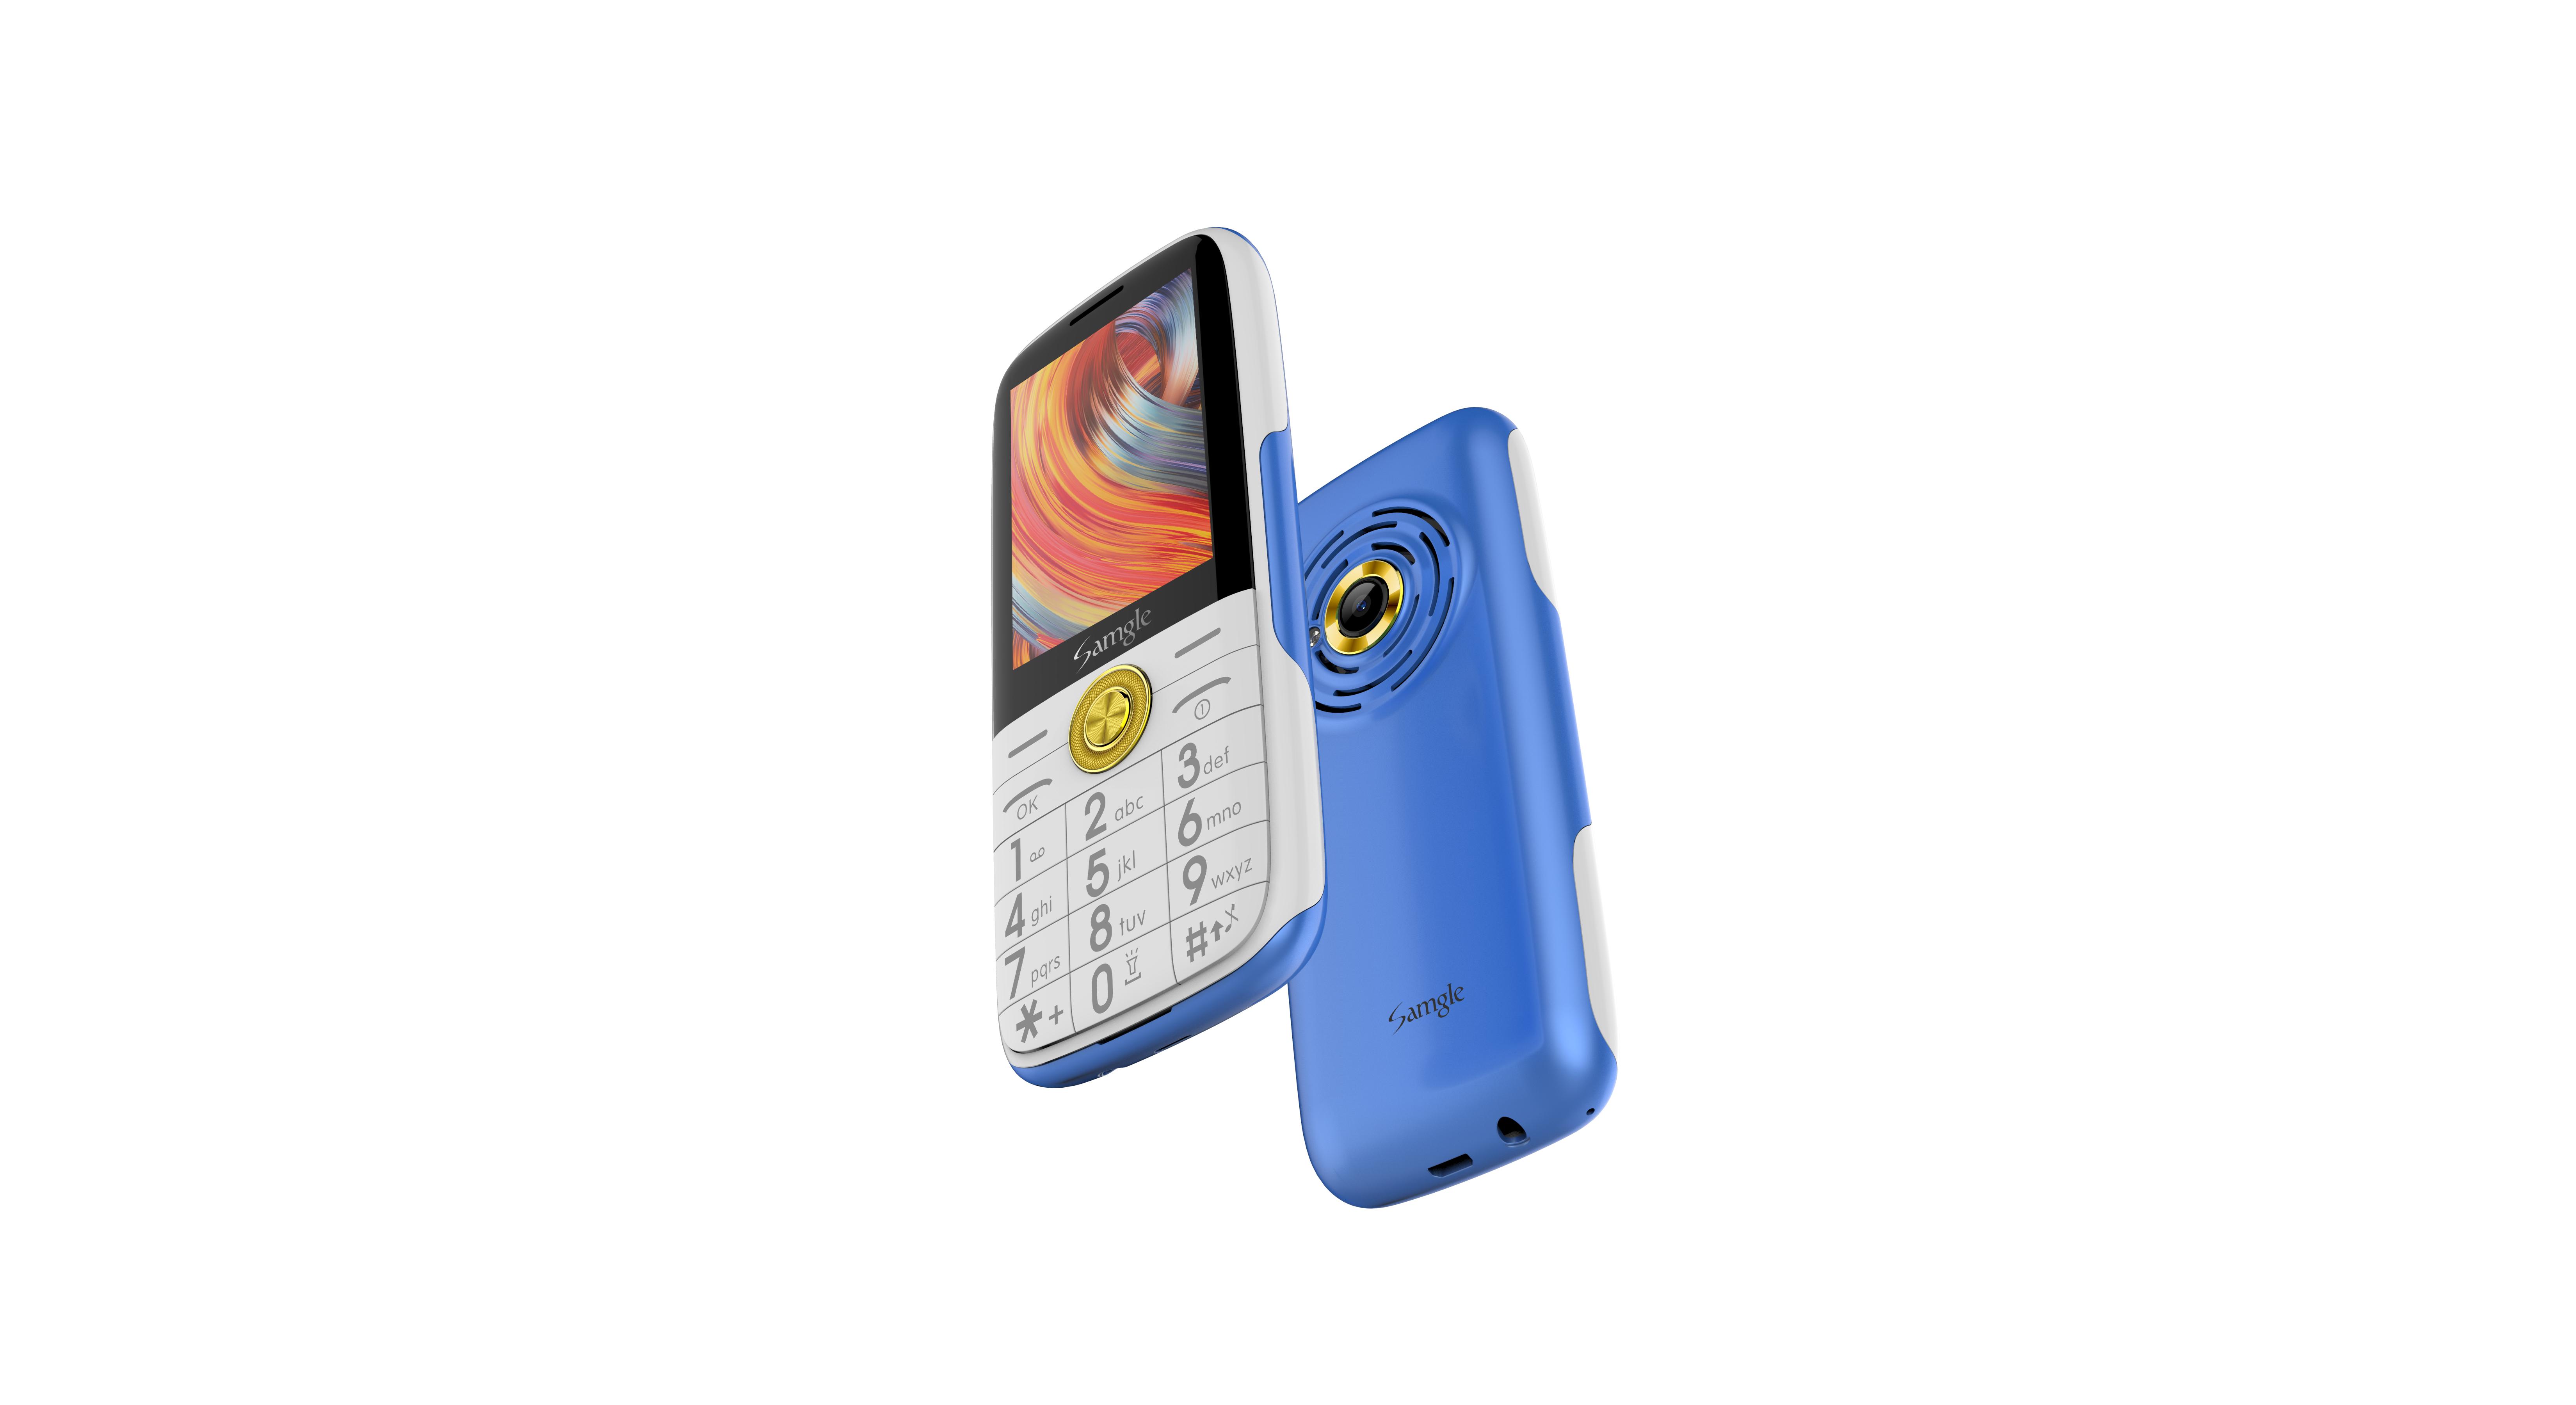 Telefon mobil Samgle Captain 3G, QVGA 2.4 inch, Bluetooth, Digi 3G, Camera, Slot Card, Radio FM, Internet, Dual SIM16